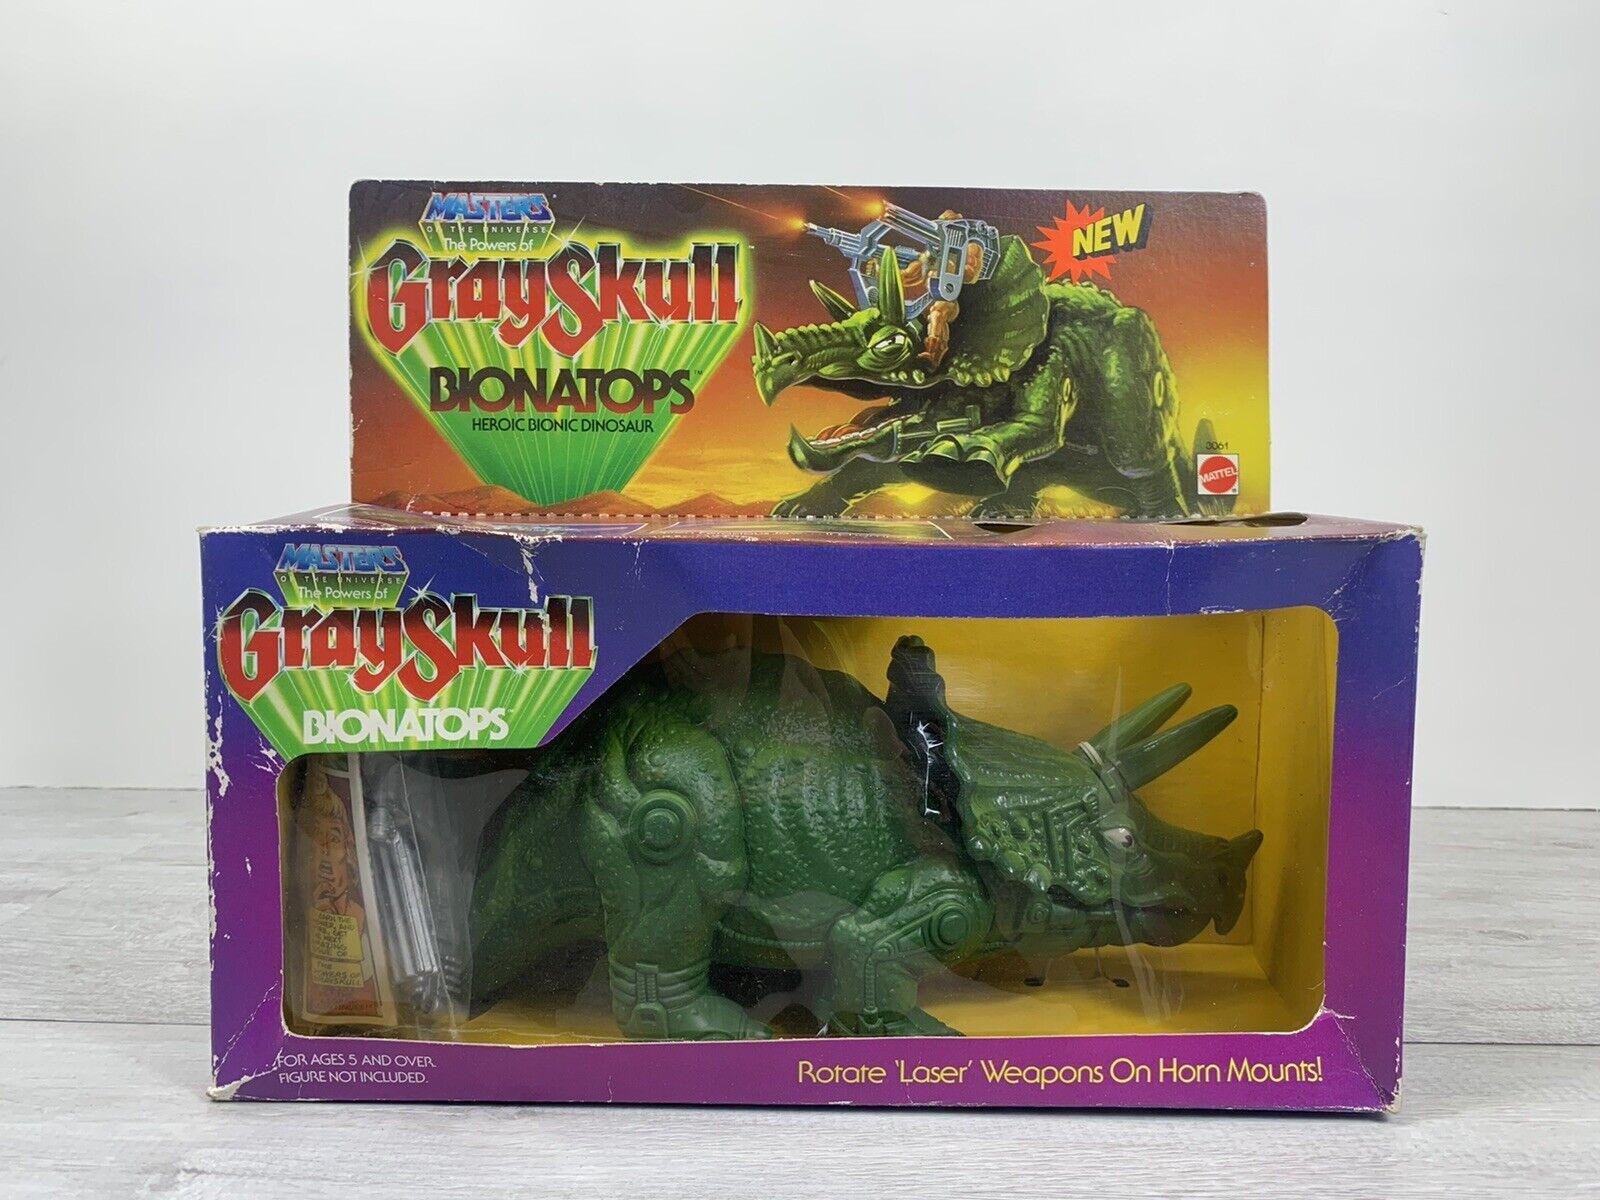 Masters Of The Universe BIONATOPS Dinosaur Mattel 1986 BOXED AND SEALED - MOTU